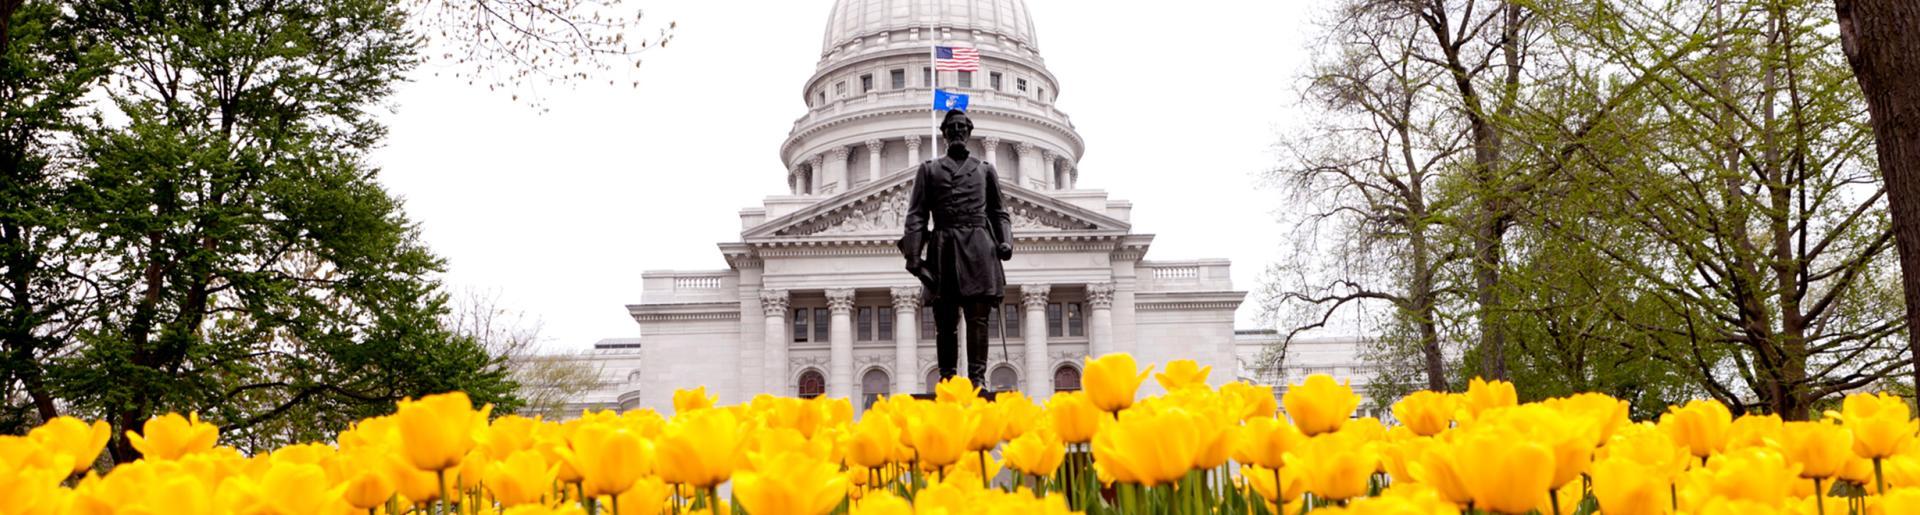 Capitol Building w Tulips